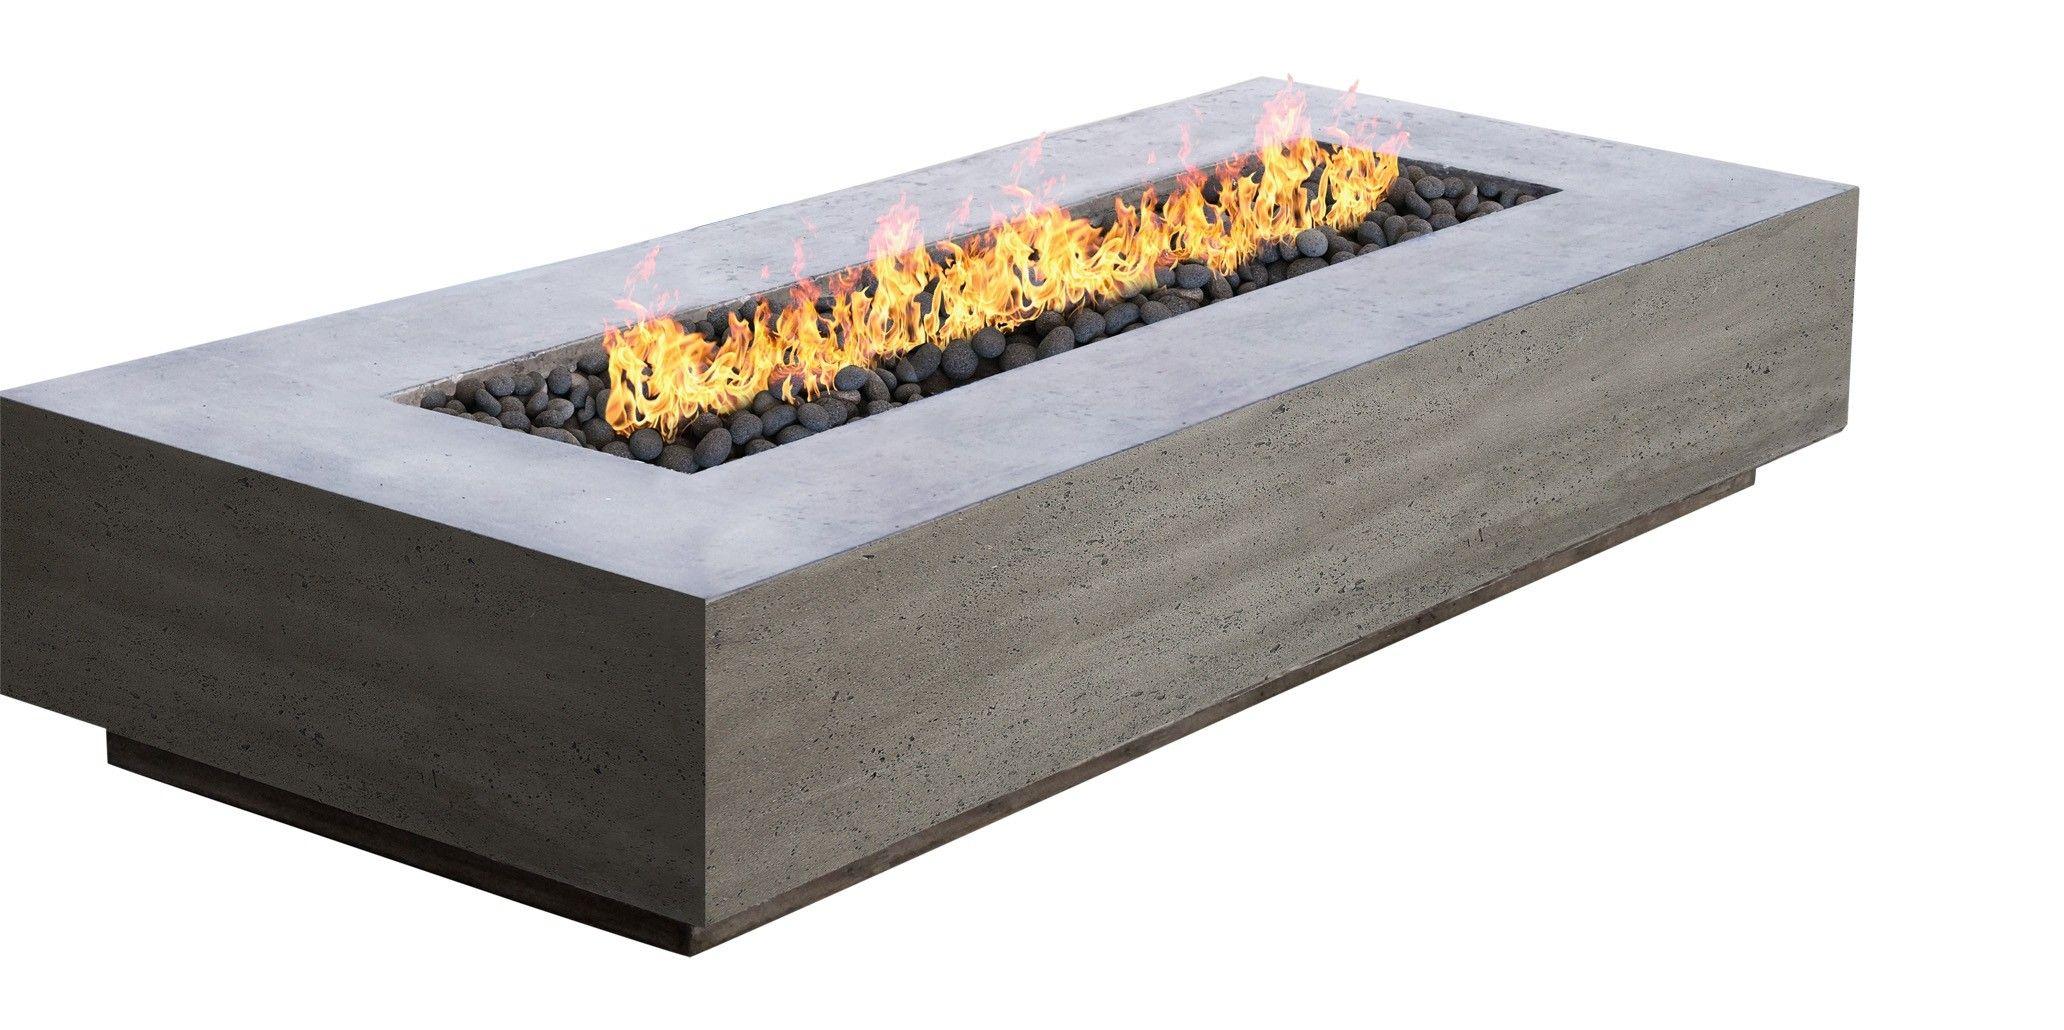 Tavola V Modern Outdoor Fire Pit Rectangle Gas And Propane Fire Pit Modern Outdoor Firepit Outdoor Fire Pit Outdoor Fire